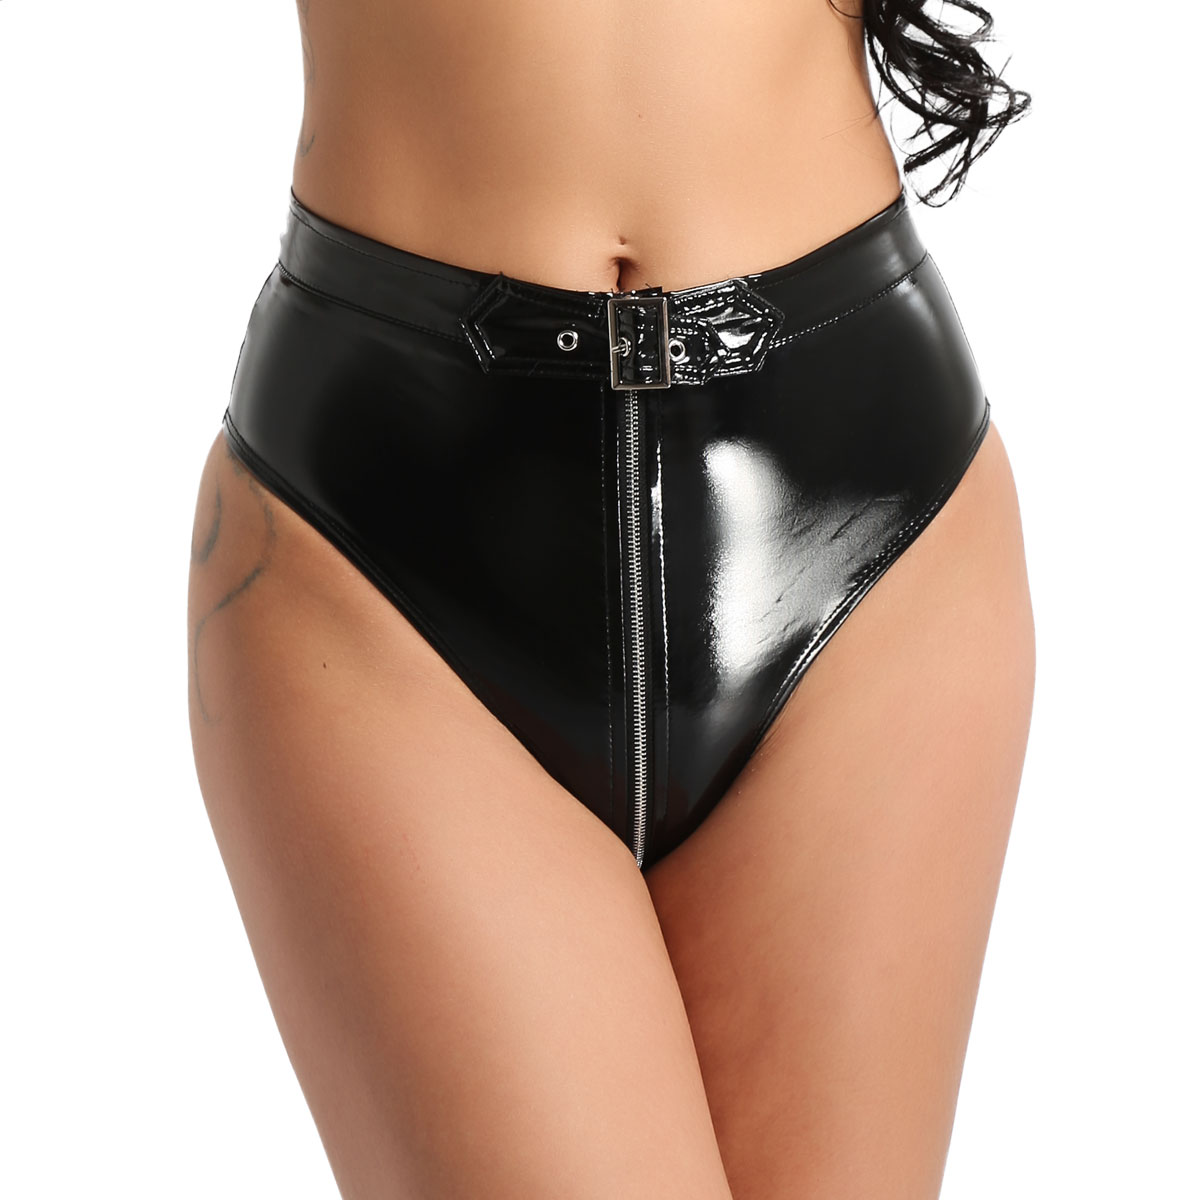 Underwear Women Sexy Lingerie Female Panties Wet Look PVC Leather Under Wear High Cut Front Zippered with Belt Briefs Underpants